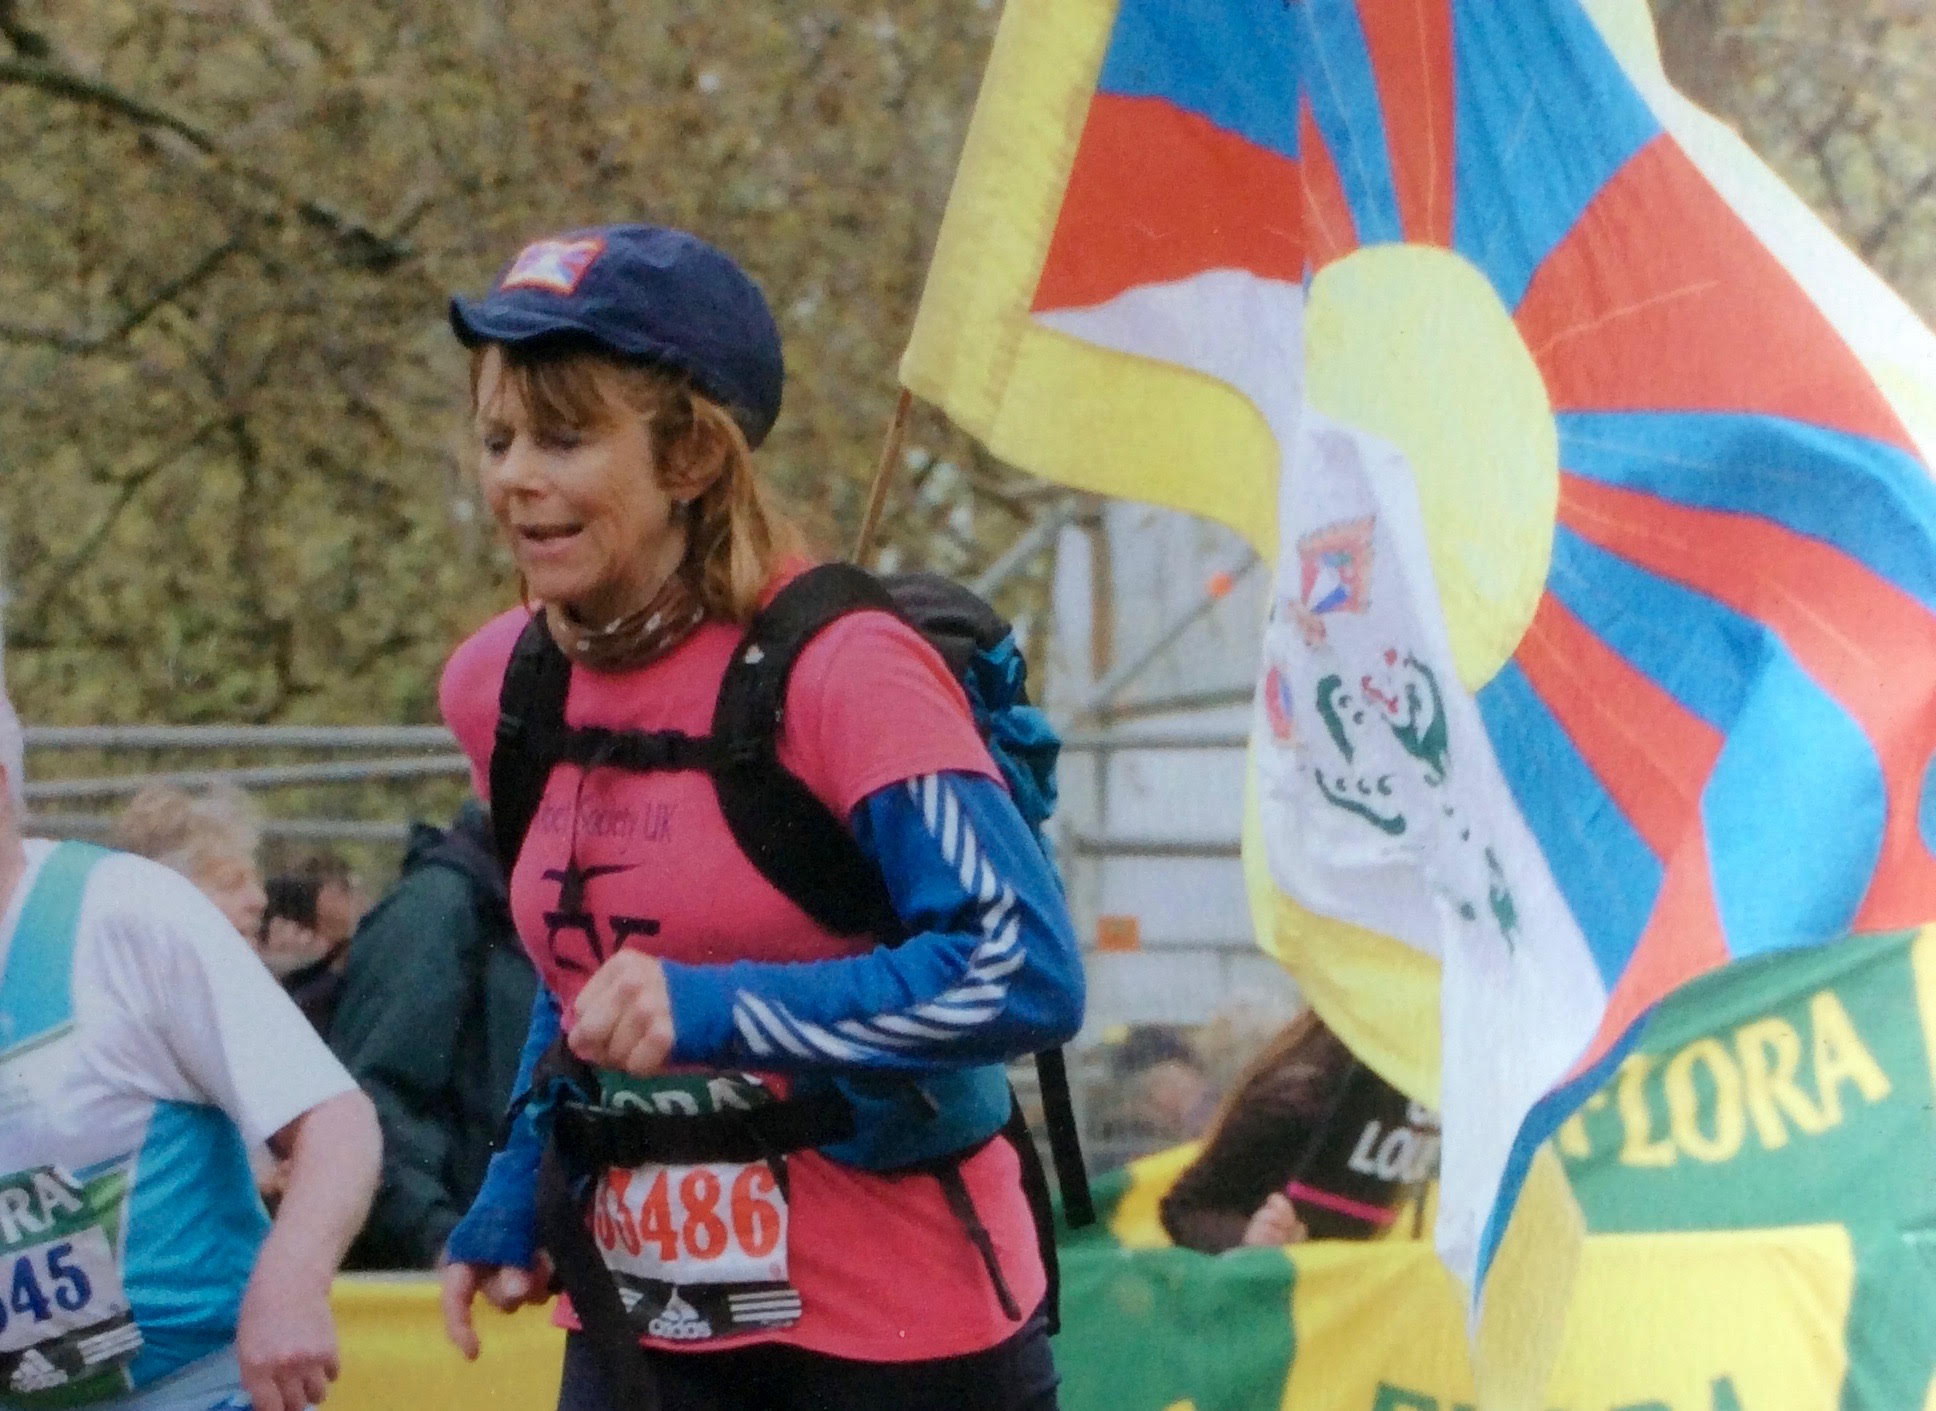 Tess runs the London Marathon 2008